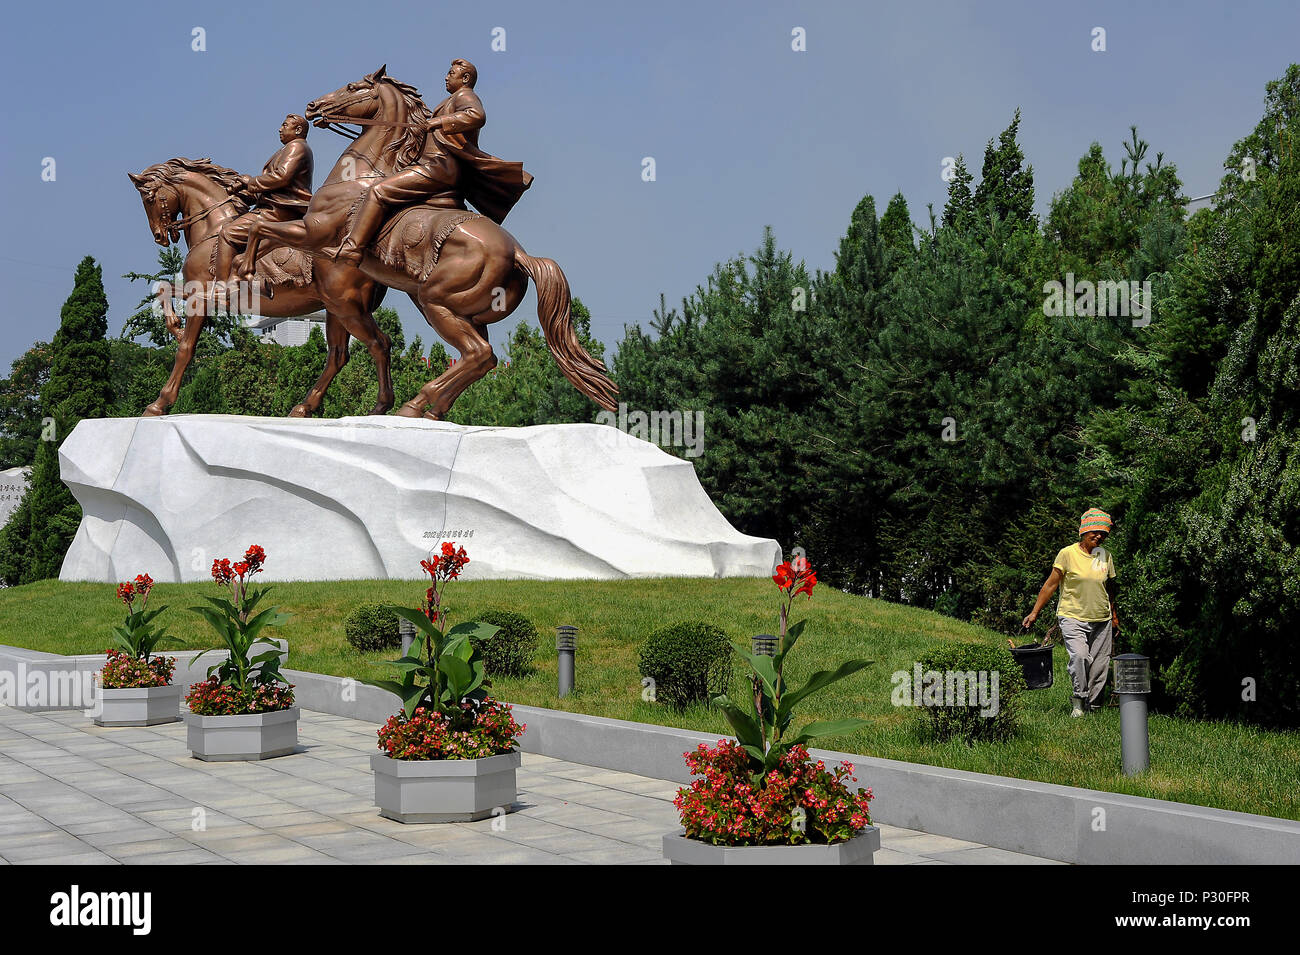 Pyongyang, North Korea, bronze figure with Kim Jong-il on the grounds of the Mansudae art studio - Stock Image